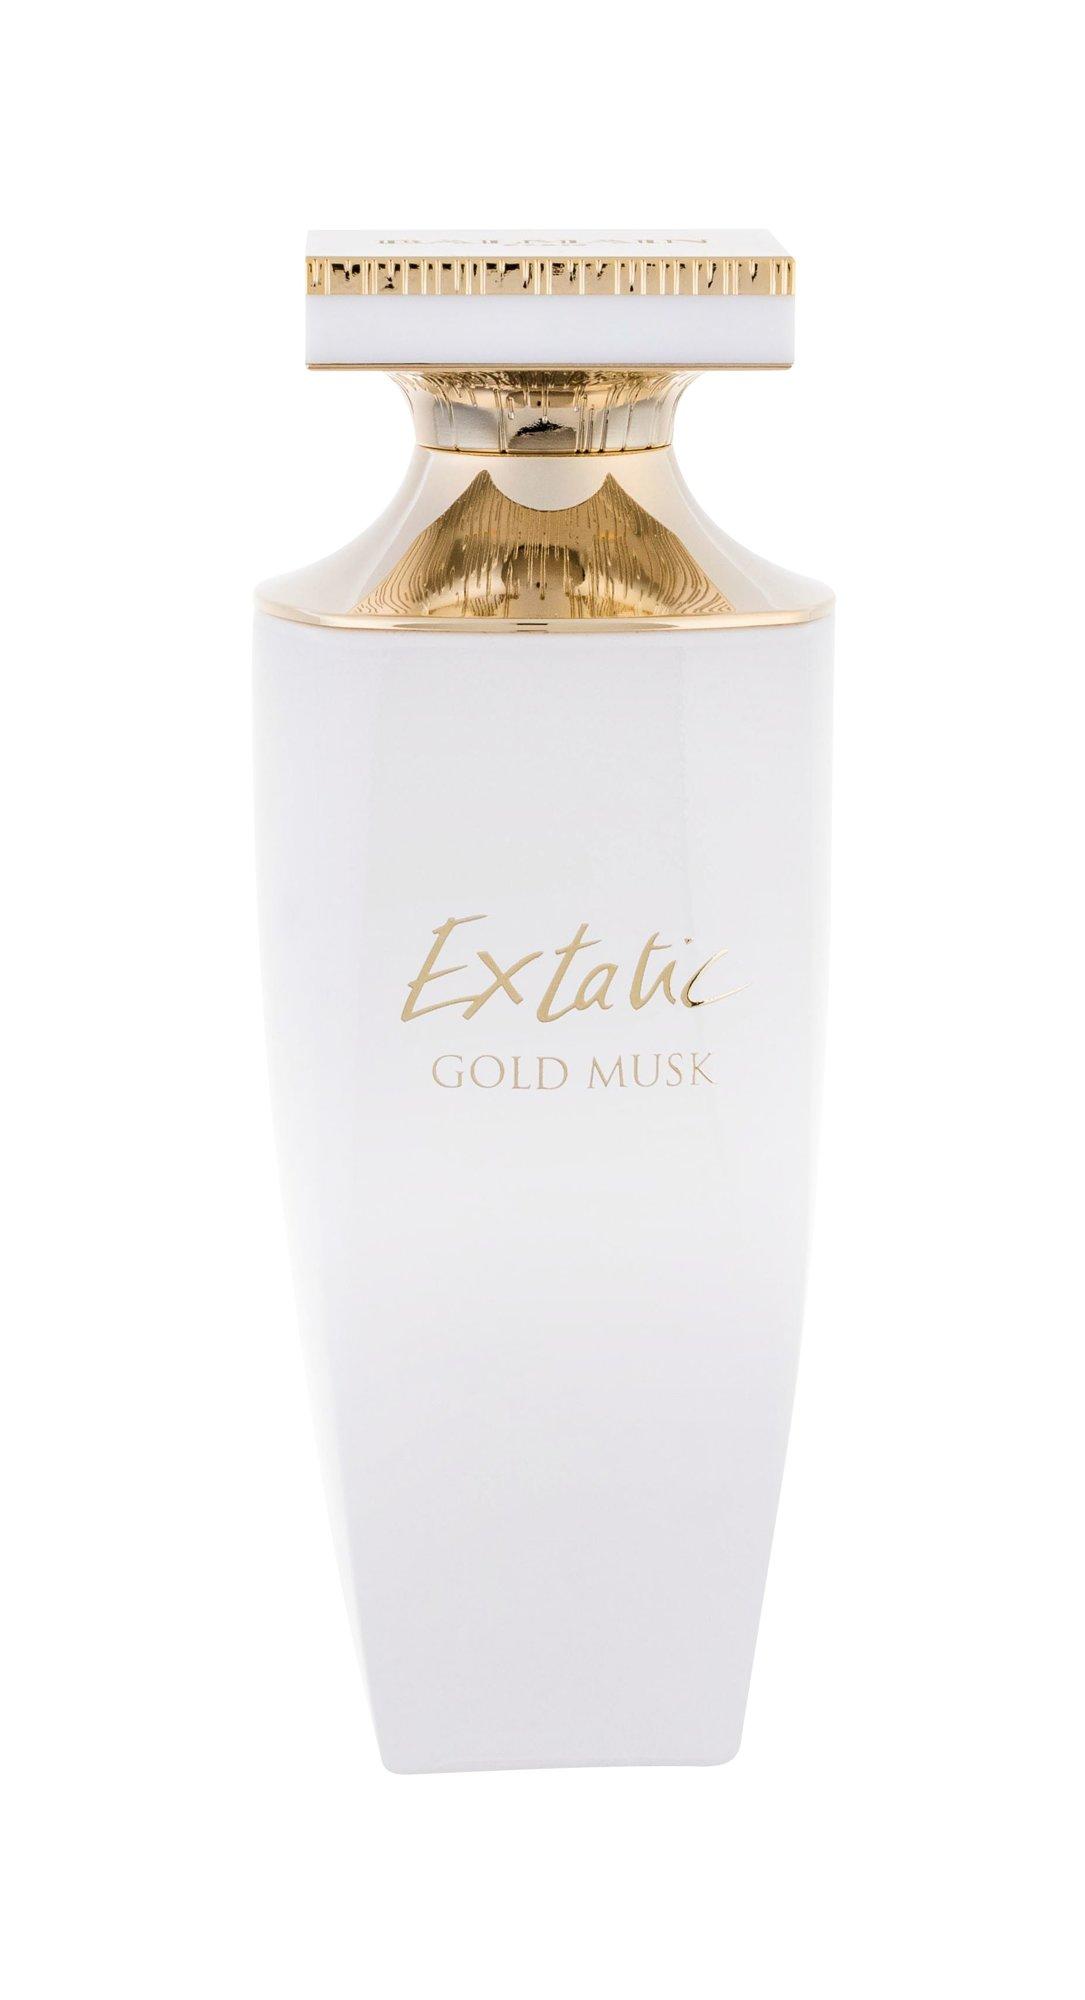 Balmain Extatic Gold Musk Eau de Toilette 90ml